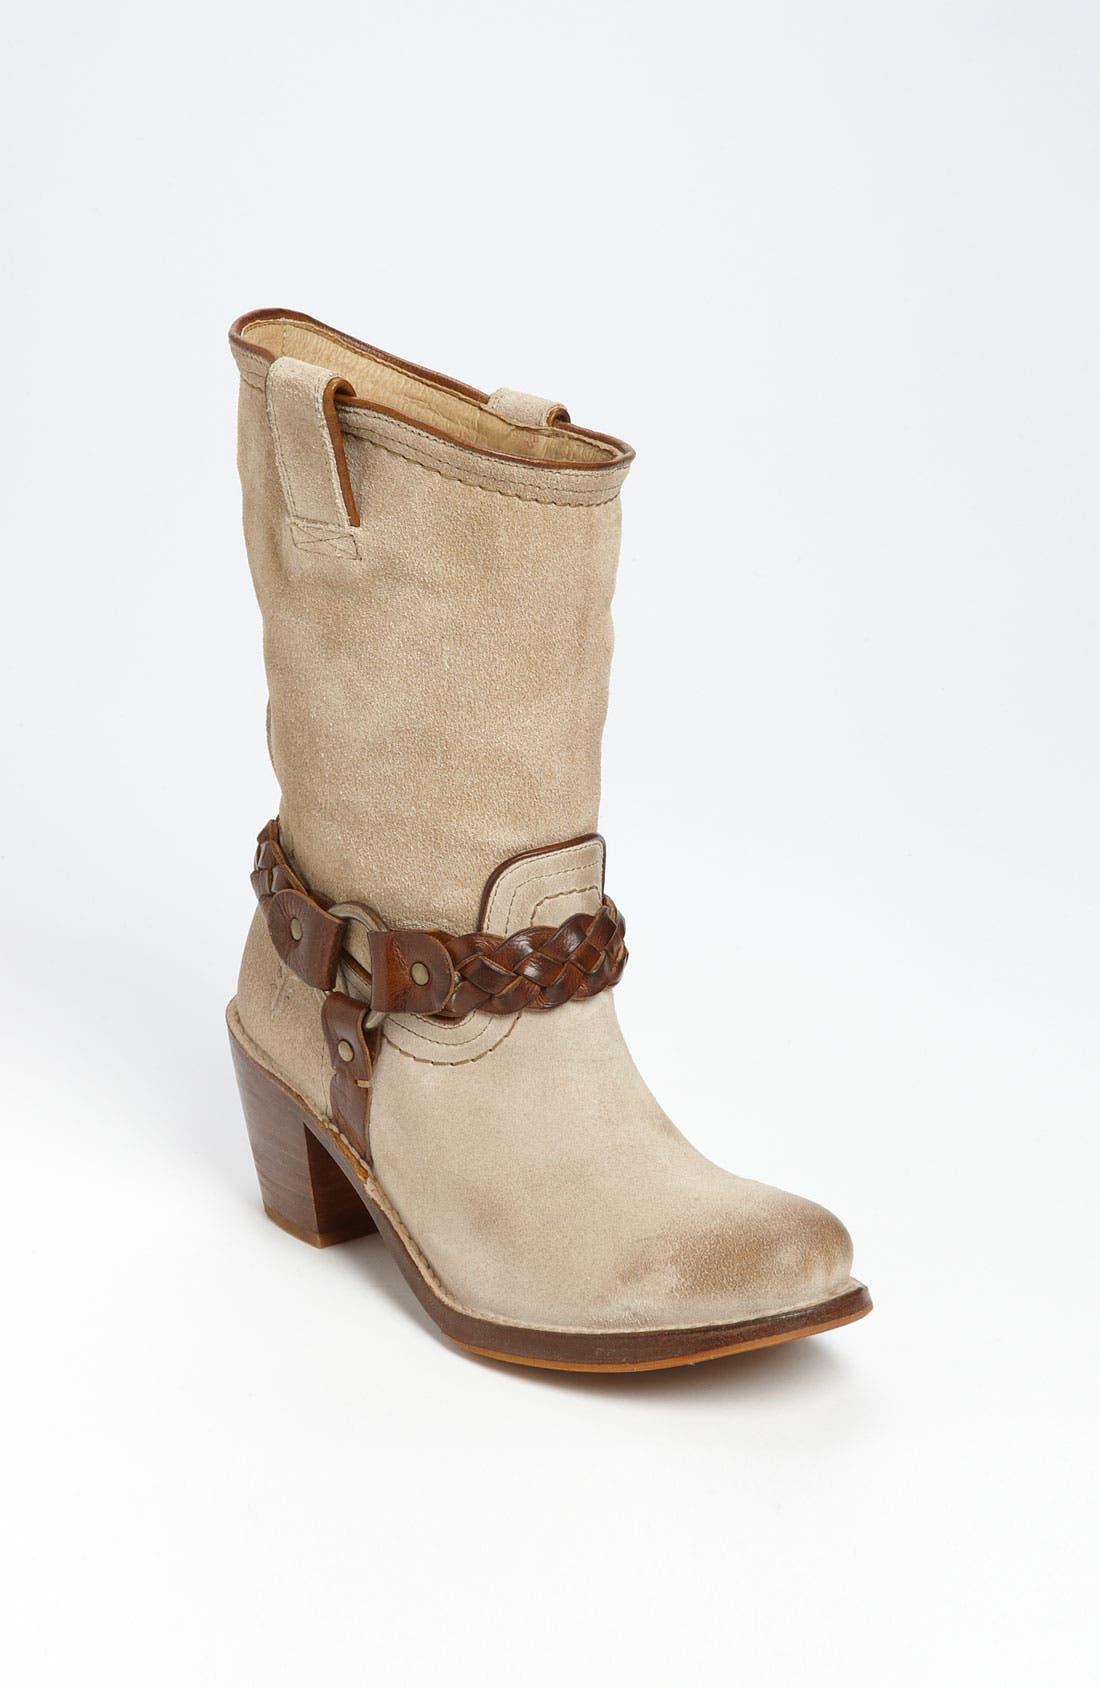 Alternate Image 1 Selected - Frye 'Carmen' Braided Harness Boot